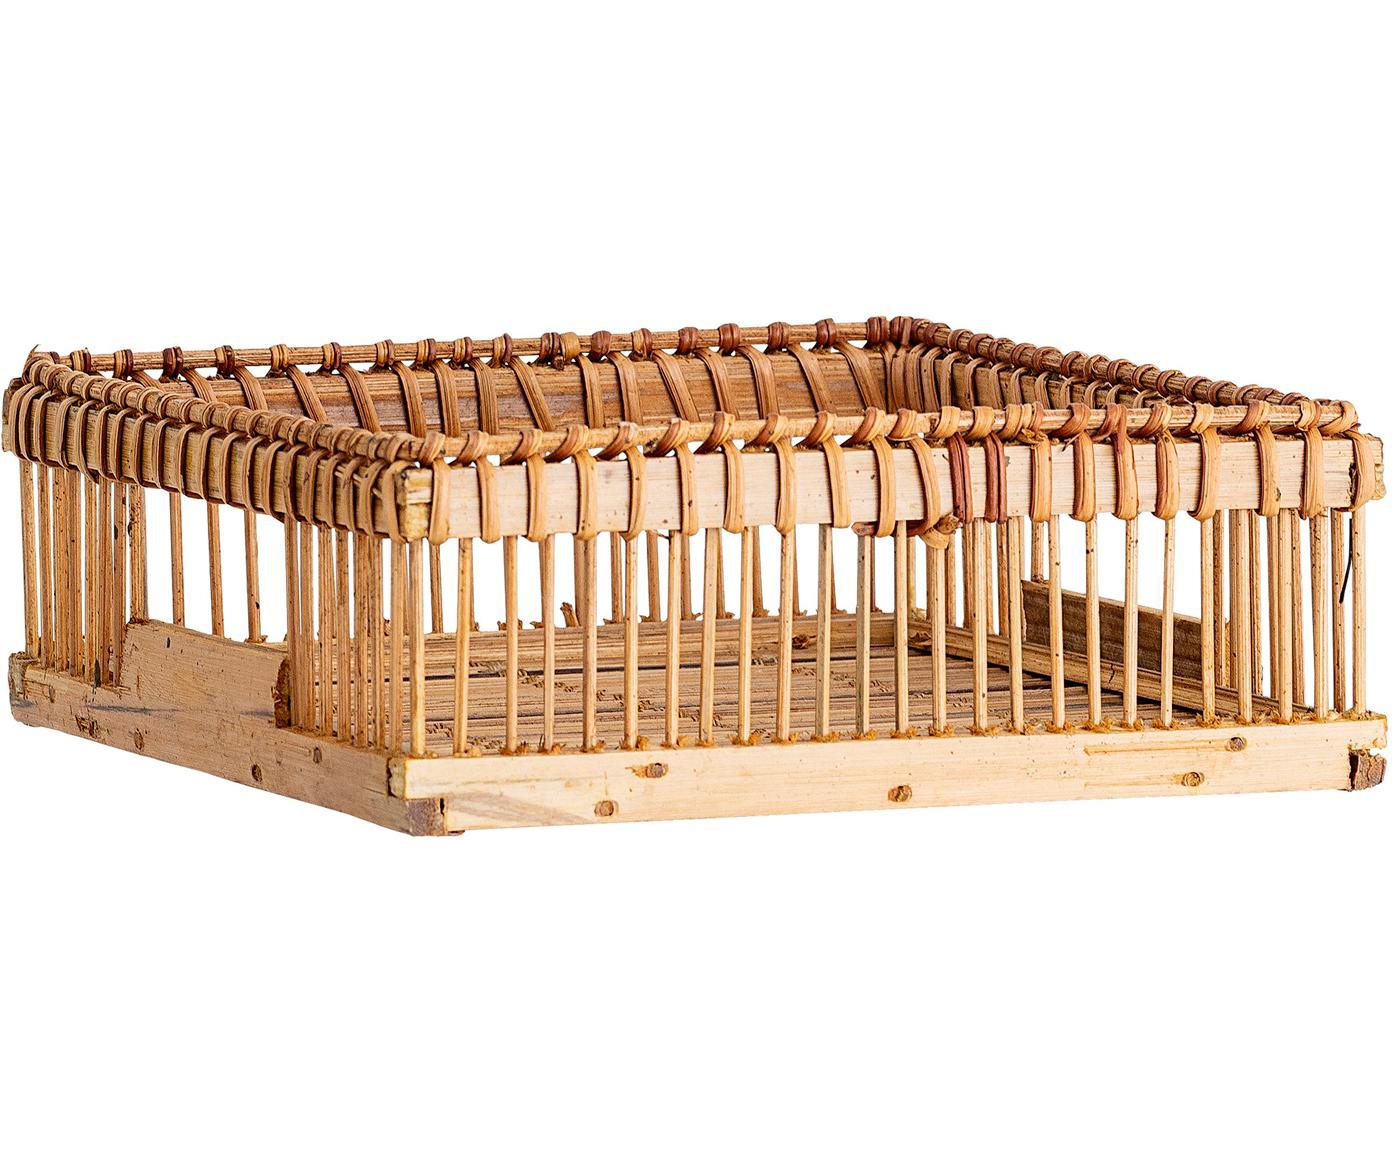 Servilletero de bambúLamgo, Bambú, Bambú, An 18 x F 18 cm